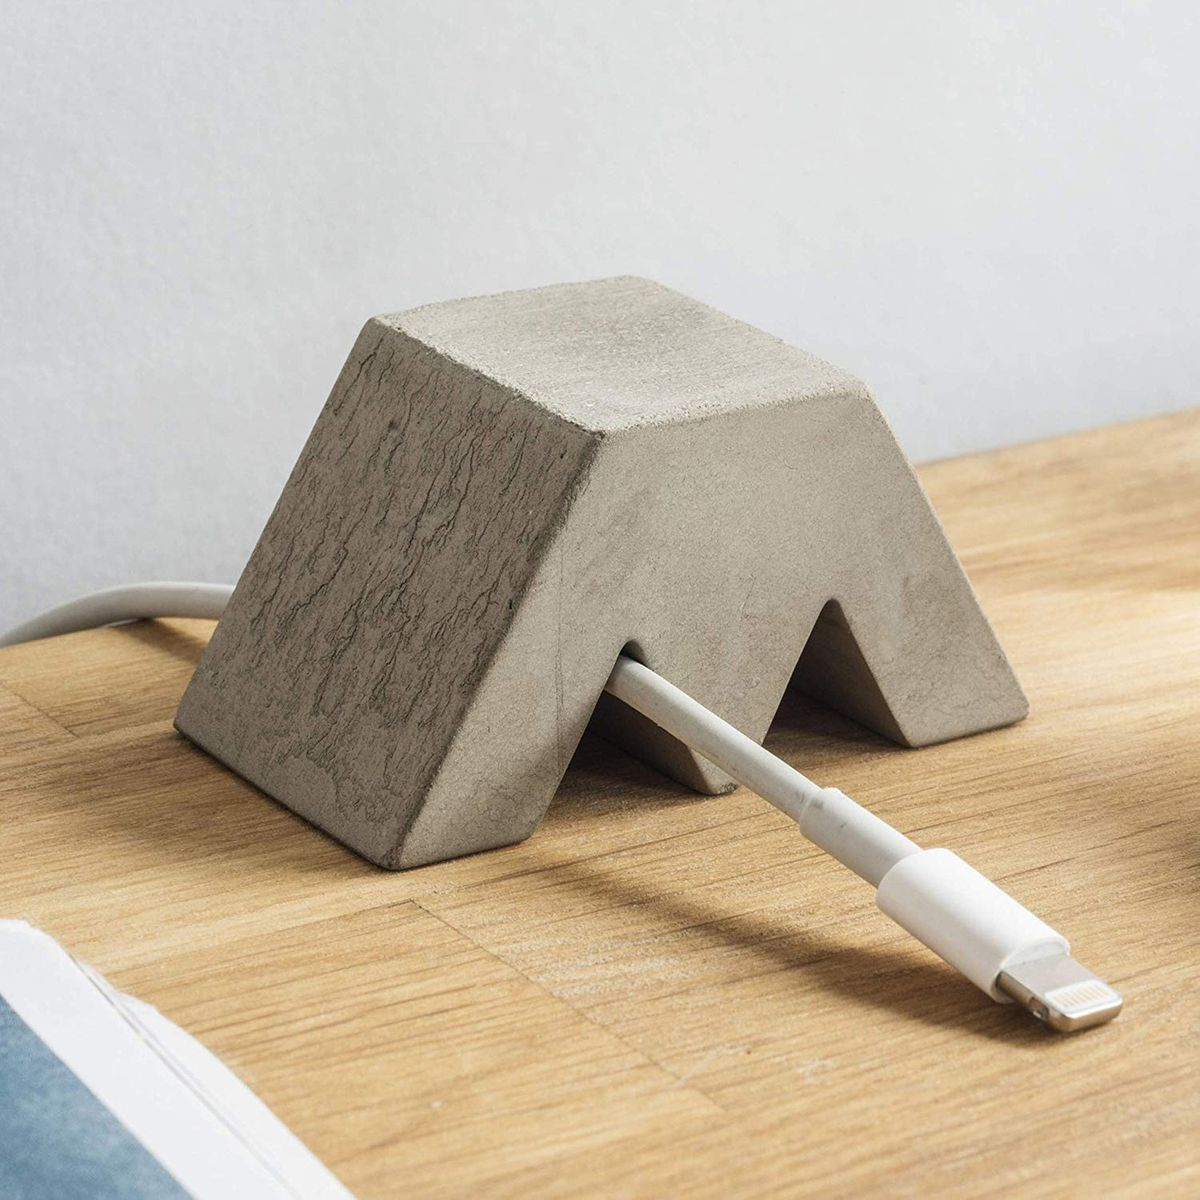 M-shaped concrete volume.